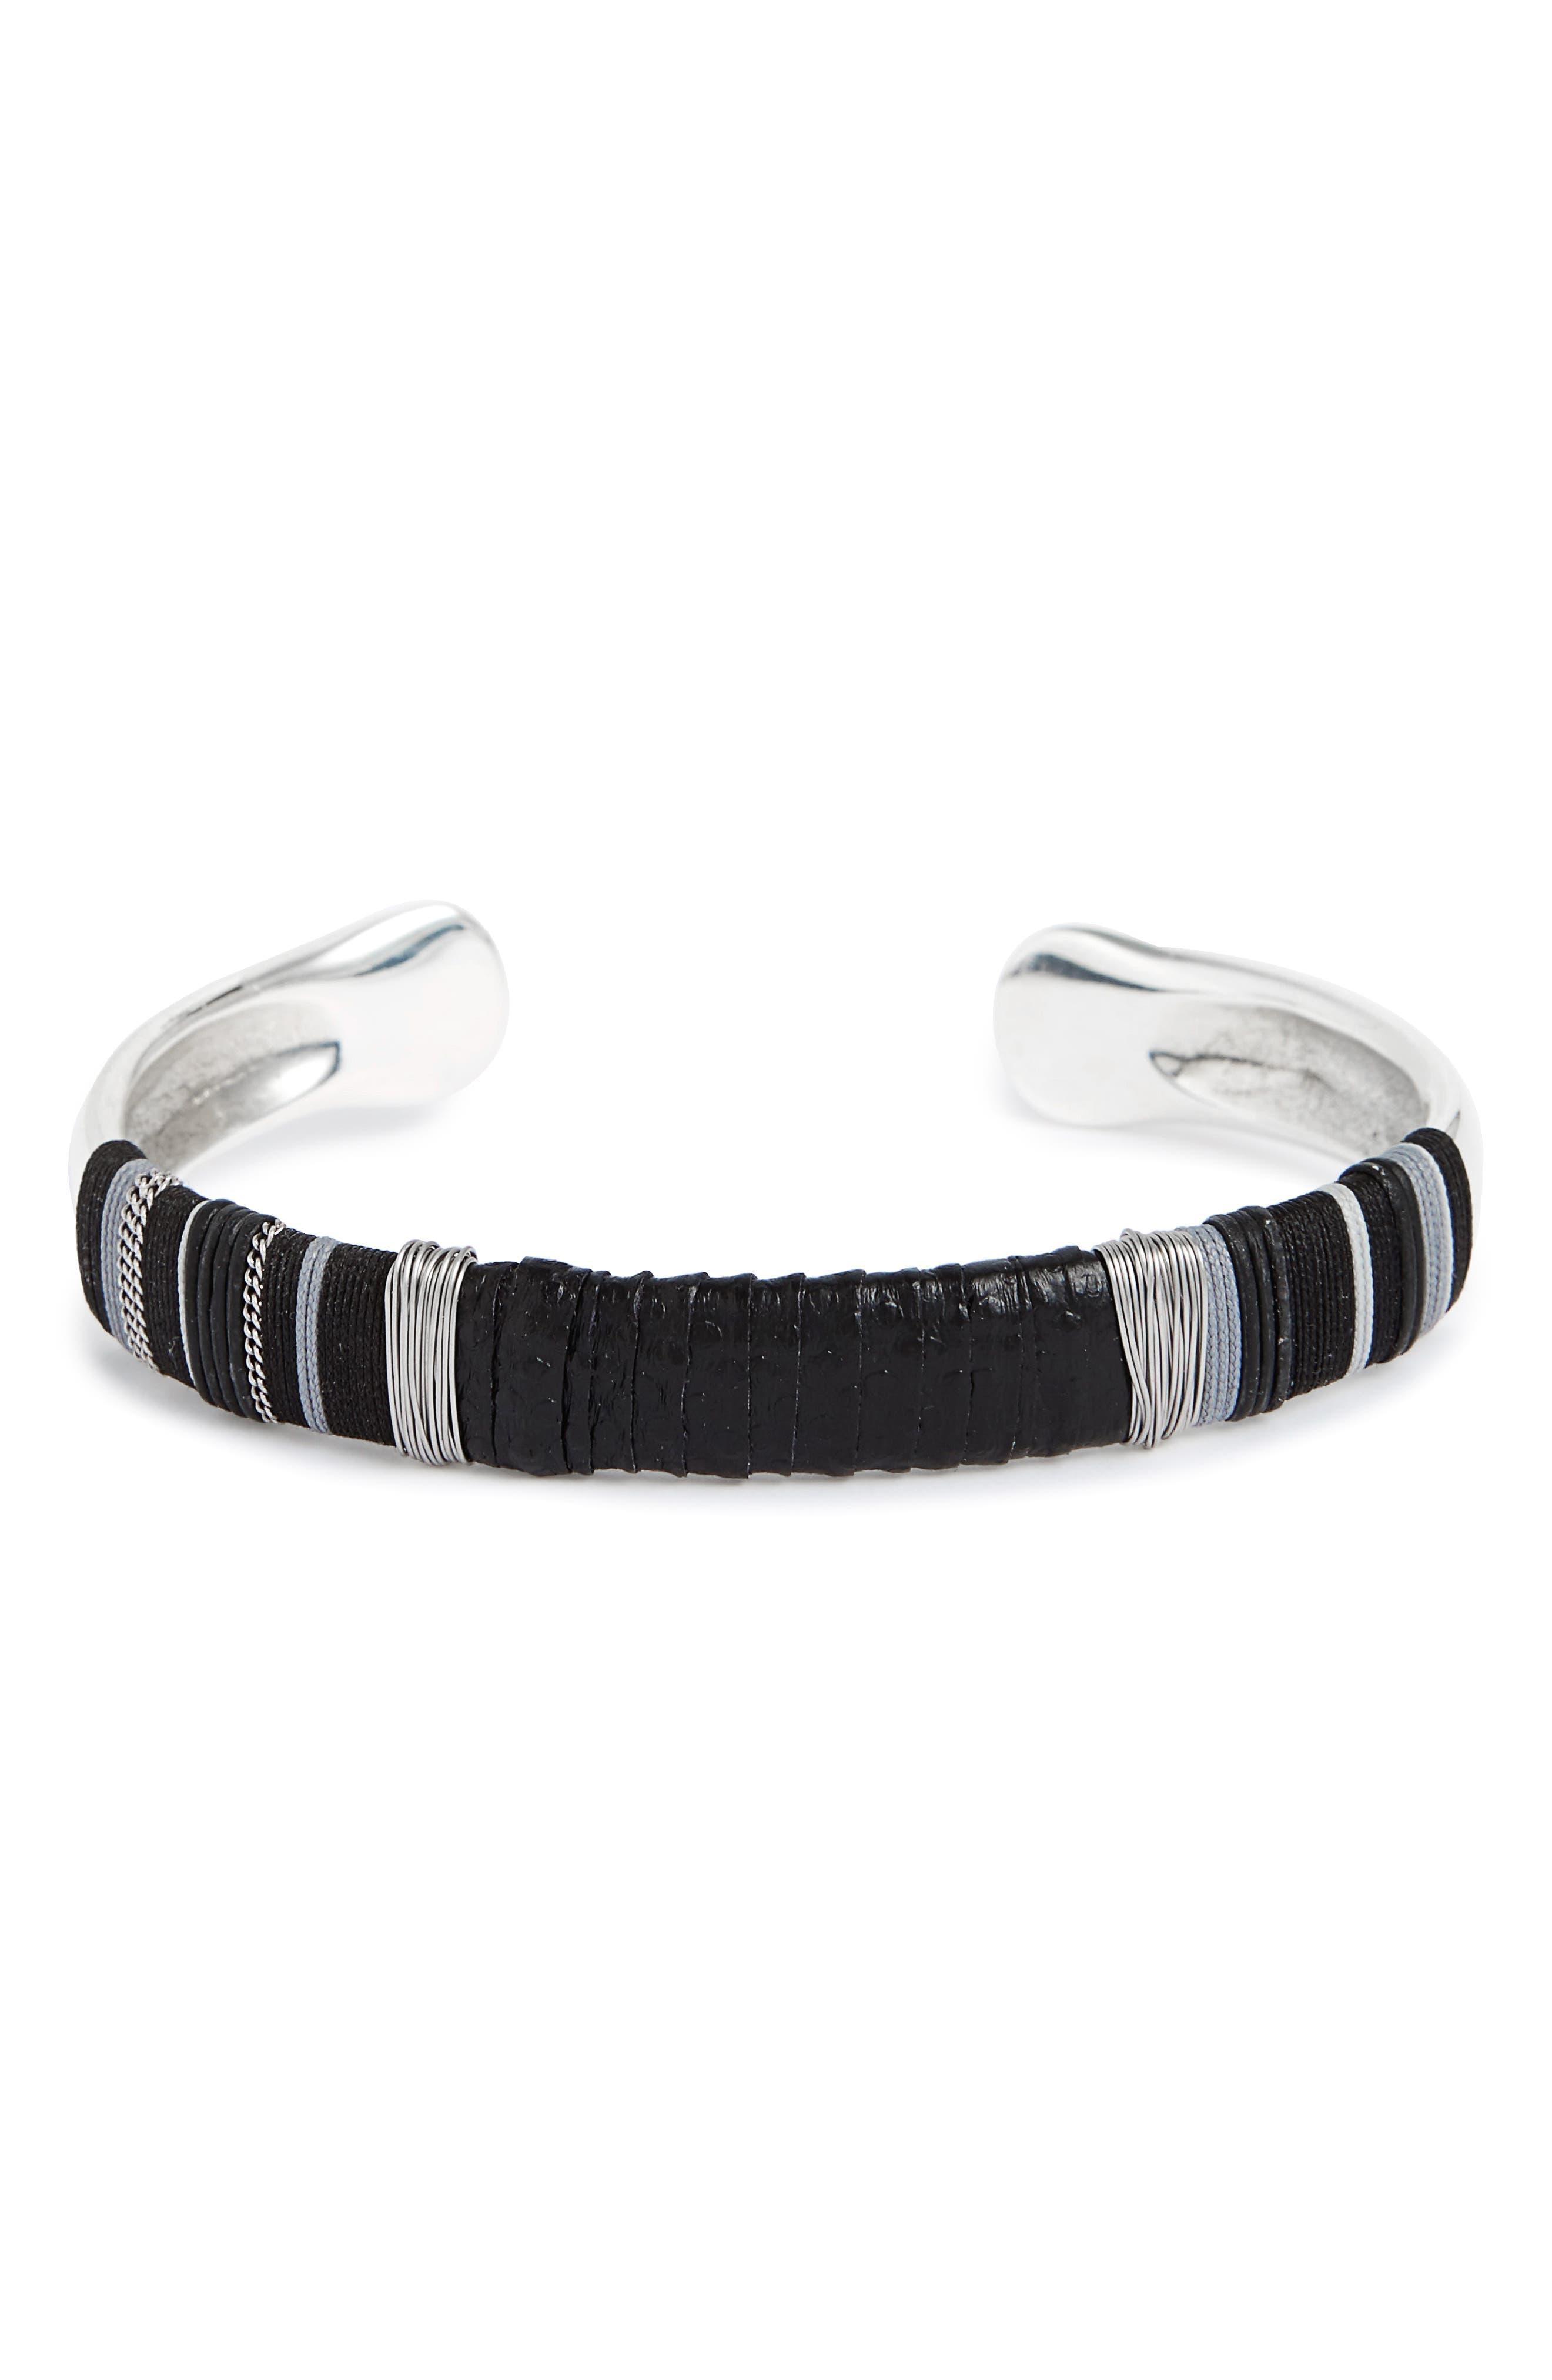 Alternate Image 1 Selected - Gas Bijoux Massai Snakeskin Cuff Bracelet